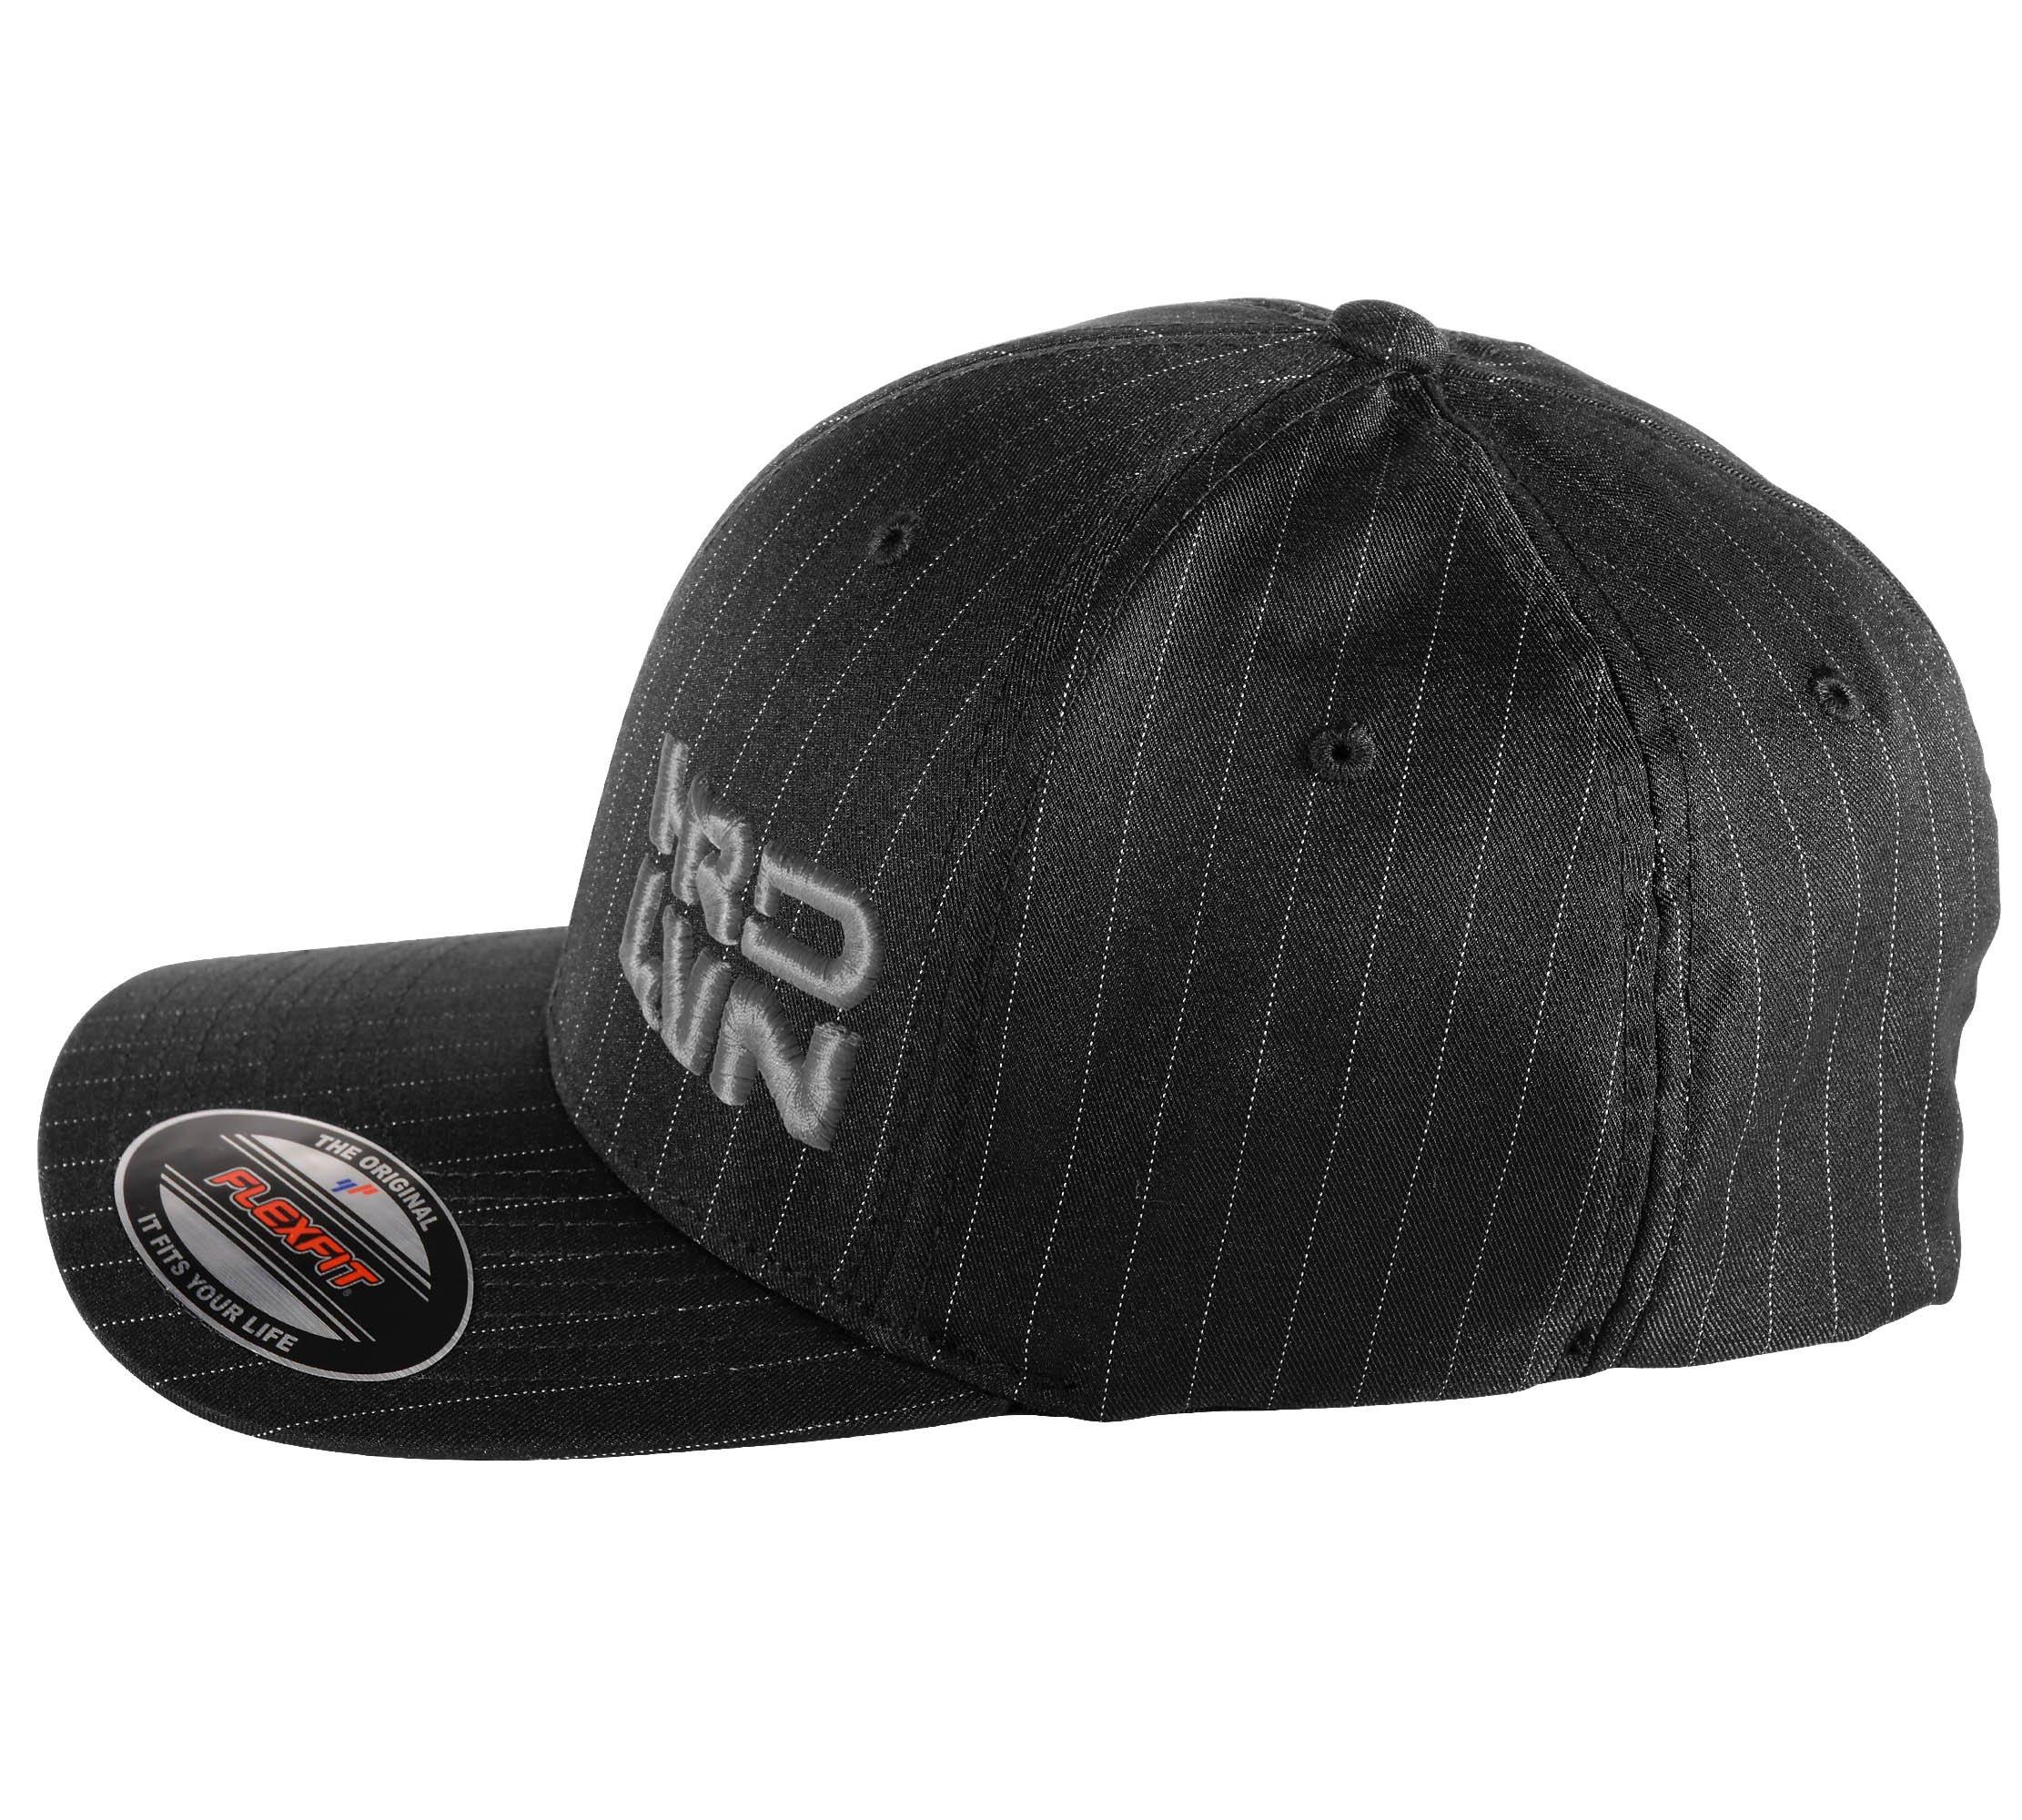 fb2f3d222f4 Amazon.com  Monsta Clothing Co.  CurvedBill Hats